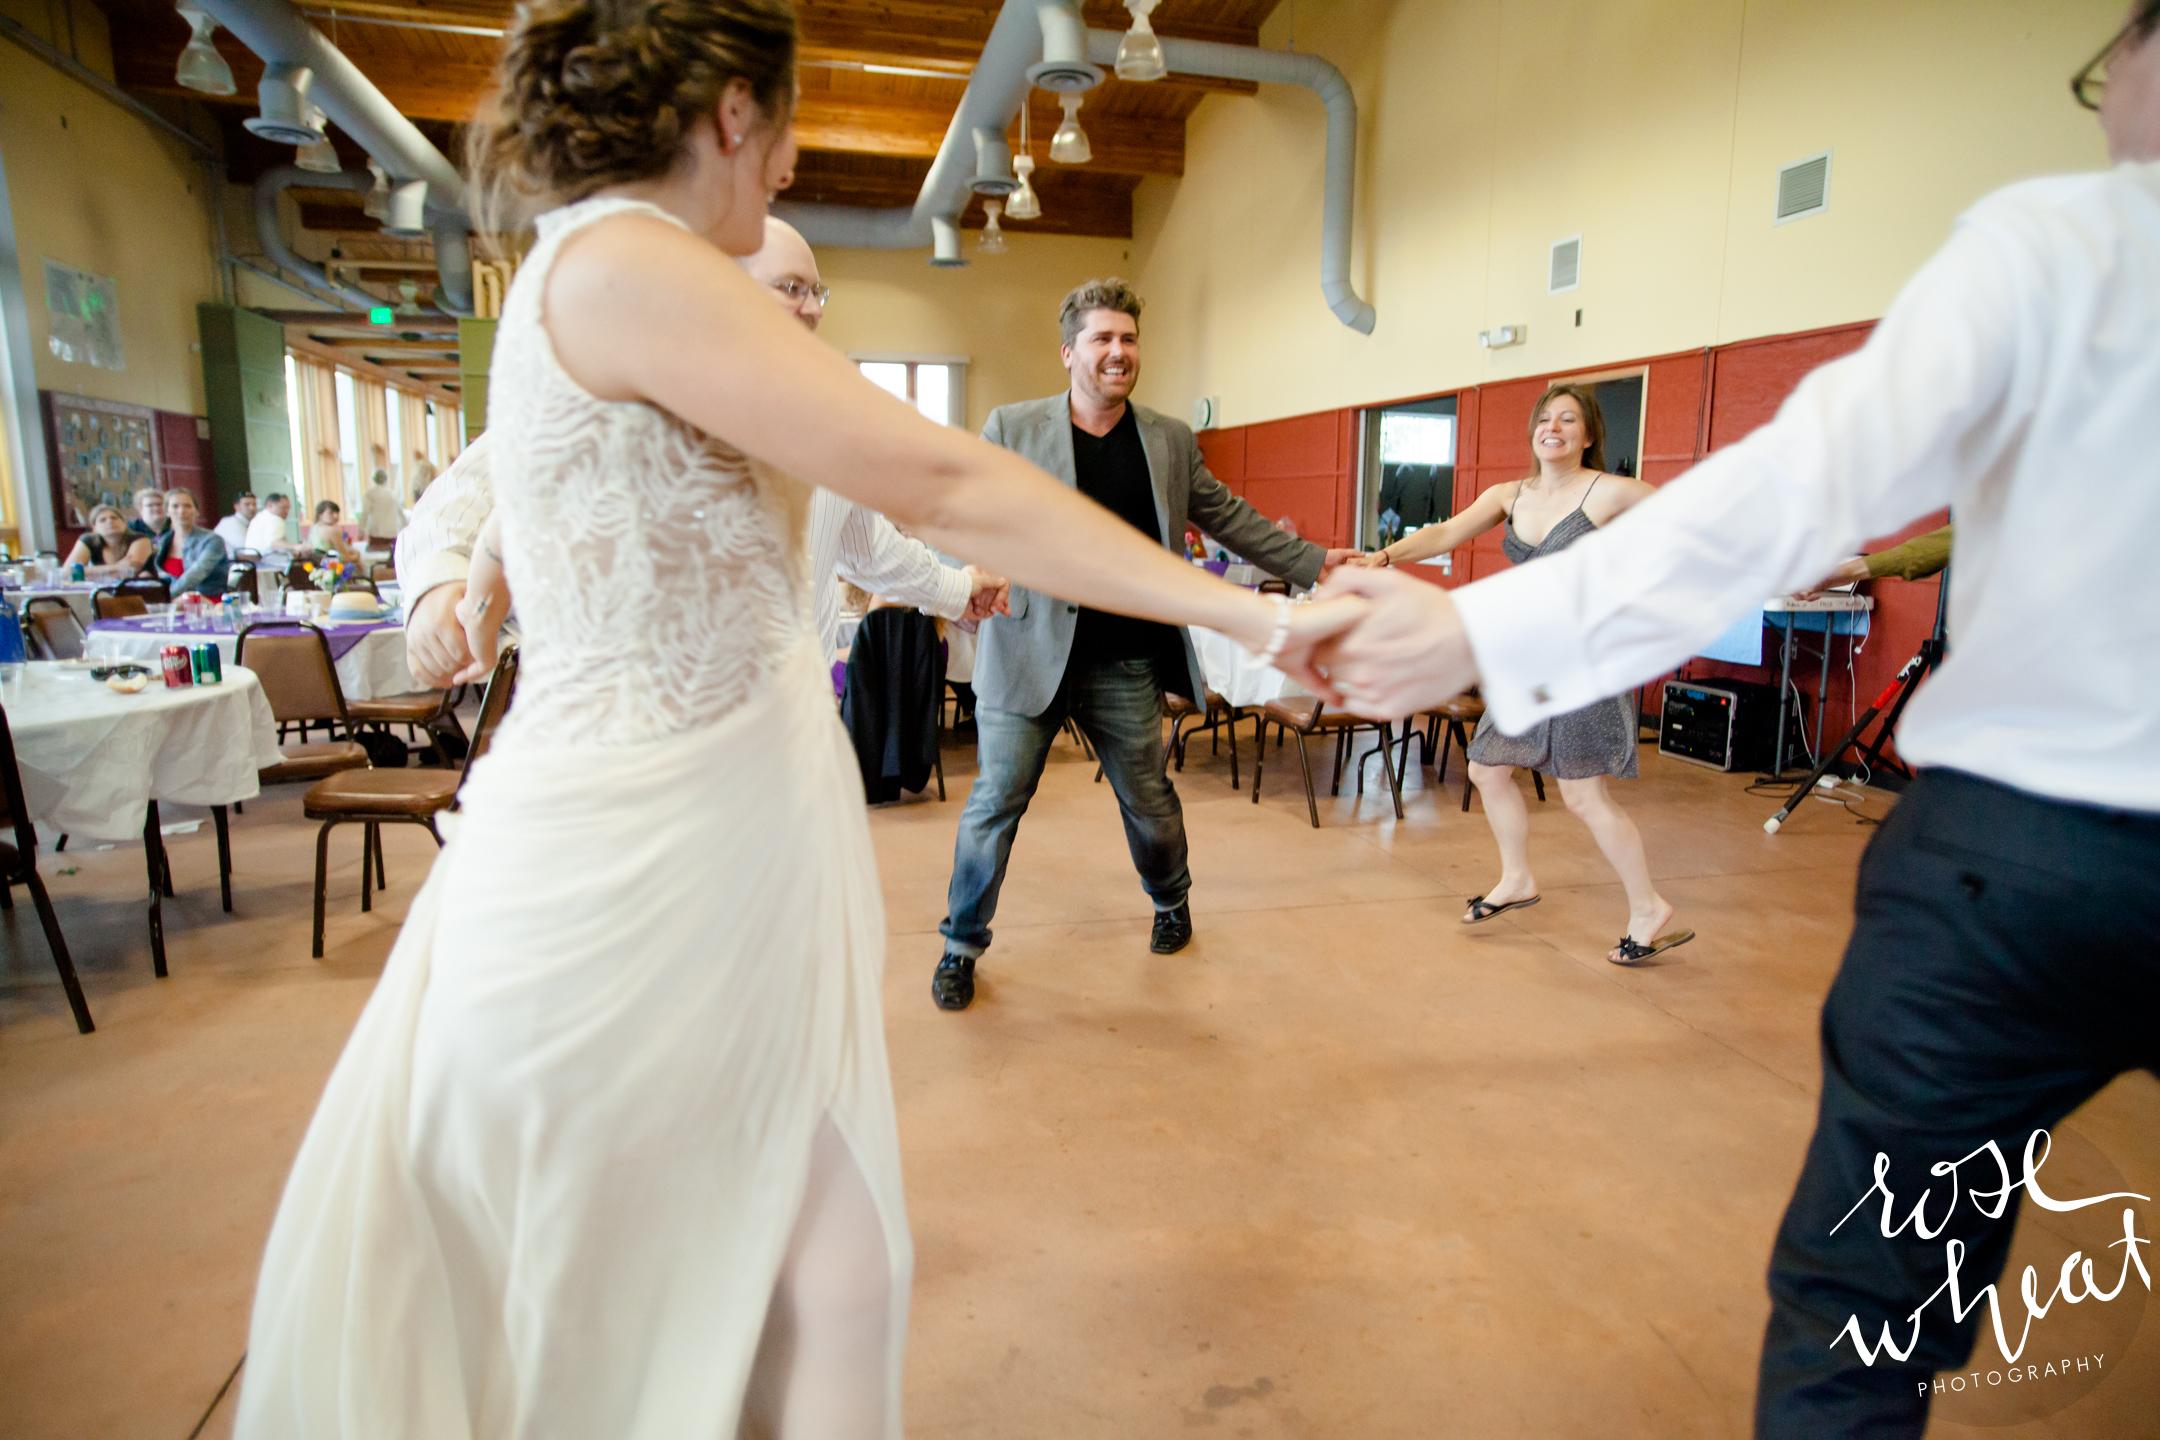 20. Birch_Hill_Fairbanks_Ak_Wedding_Rose_Wheat_Photography.jpg-12.jpg